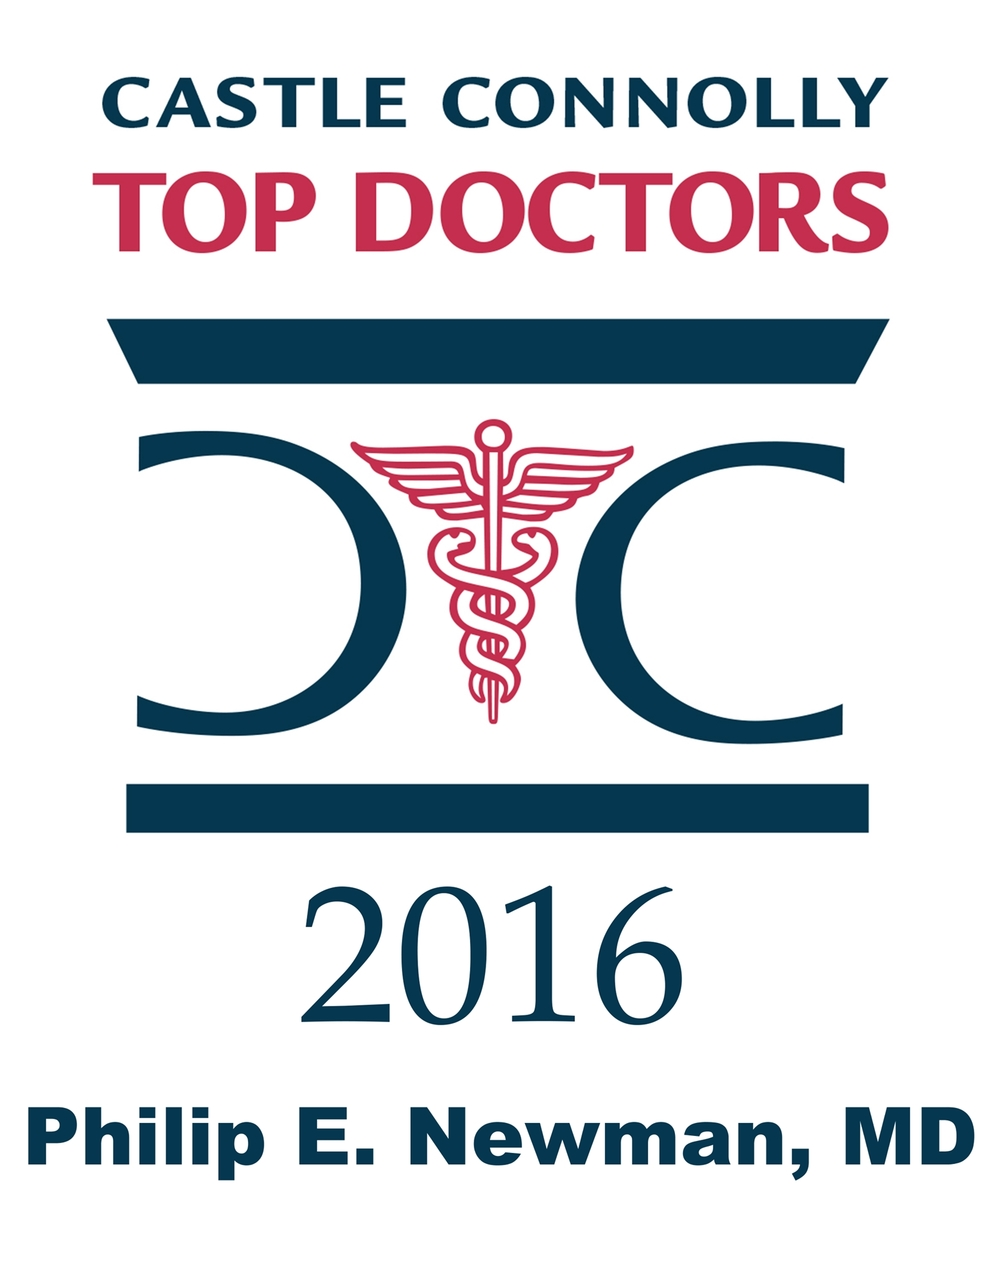 Dr. Newman - Top Docs 2016.jpg